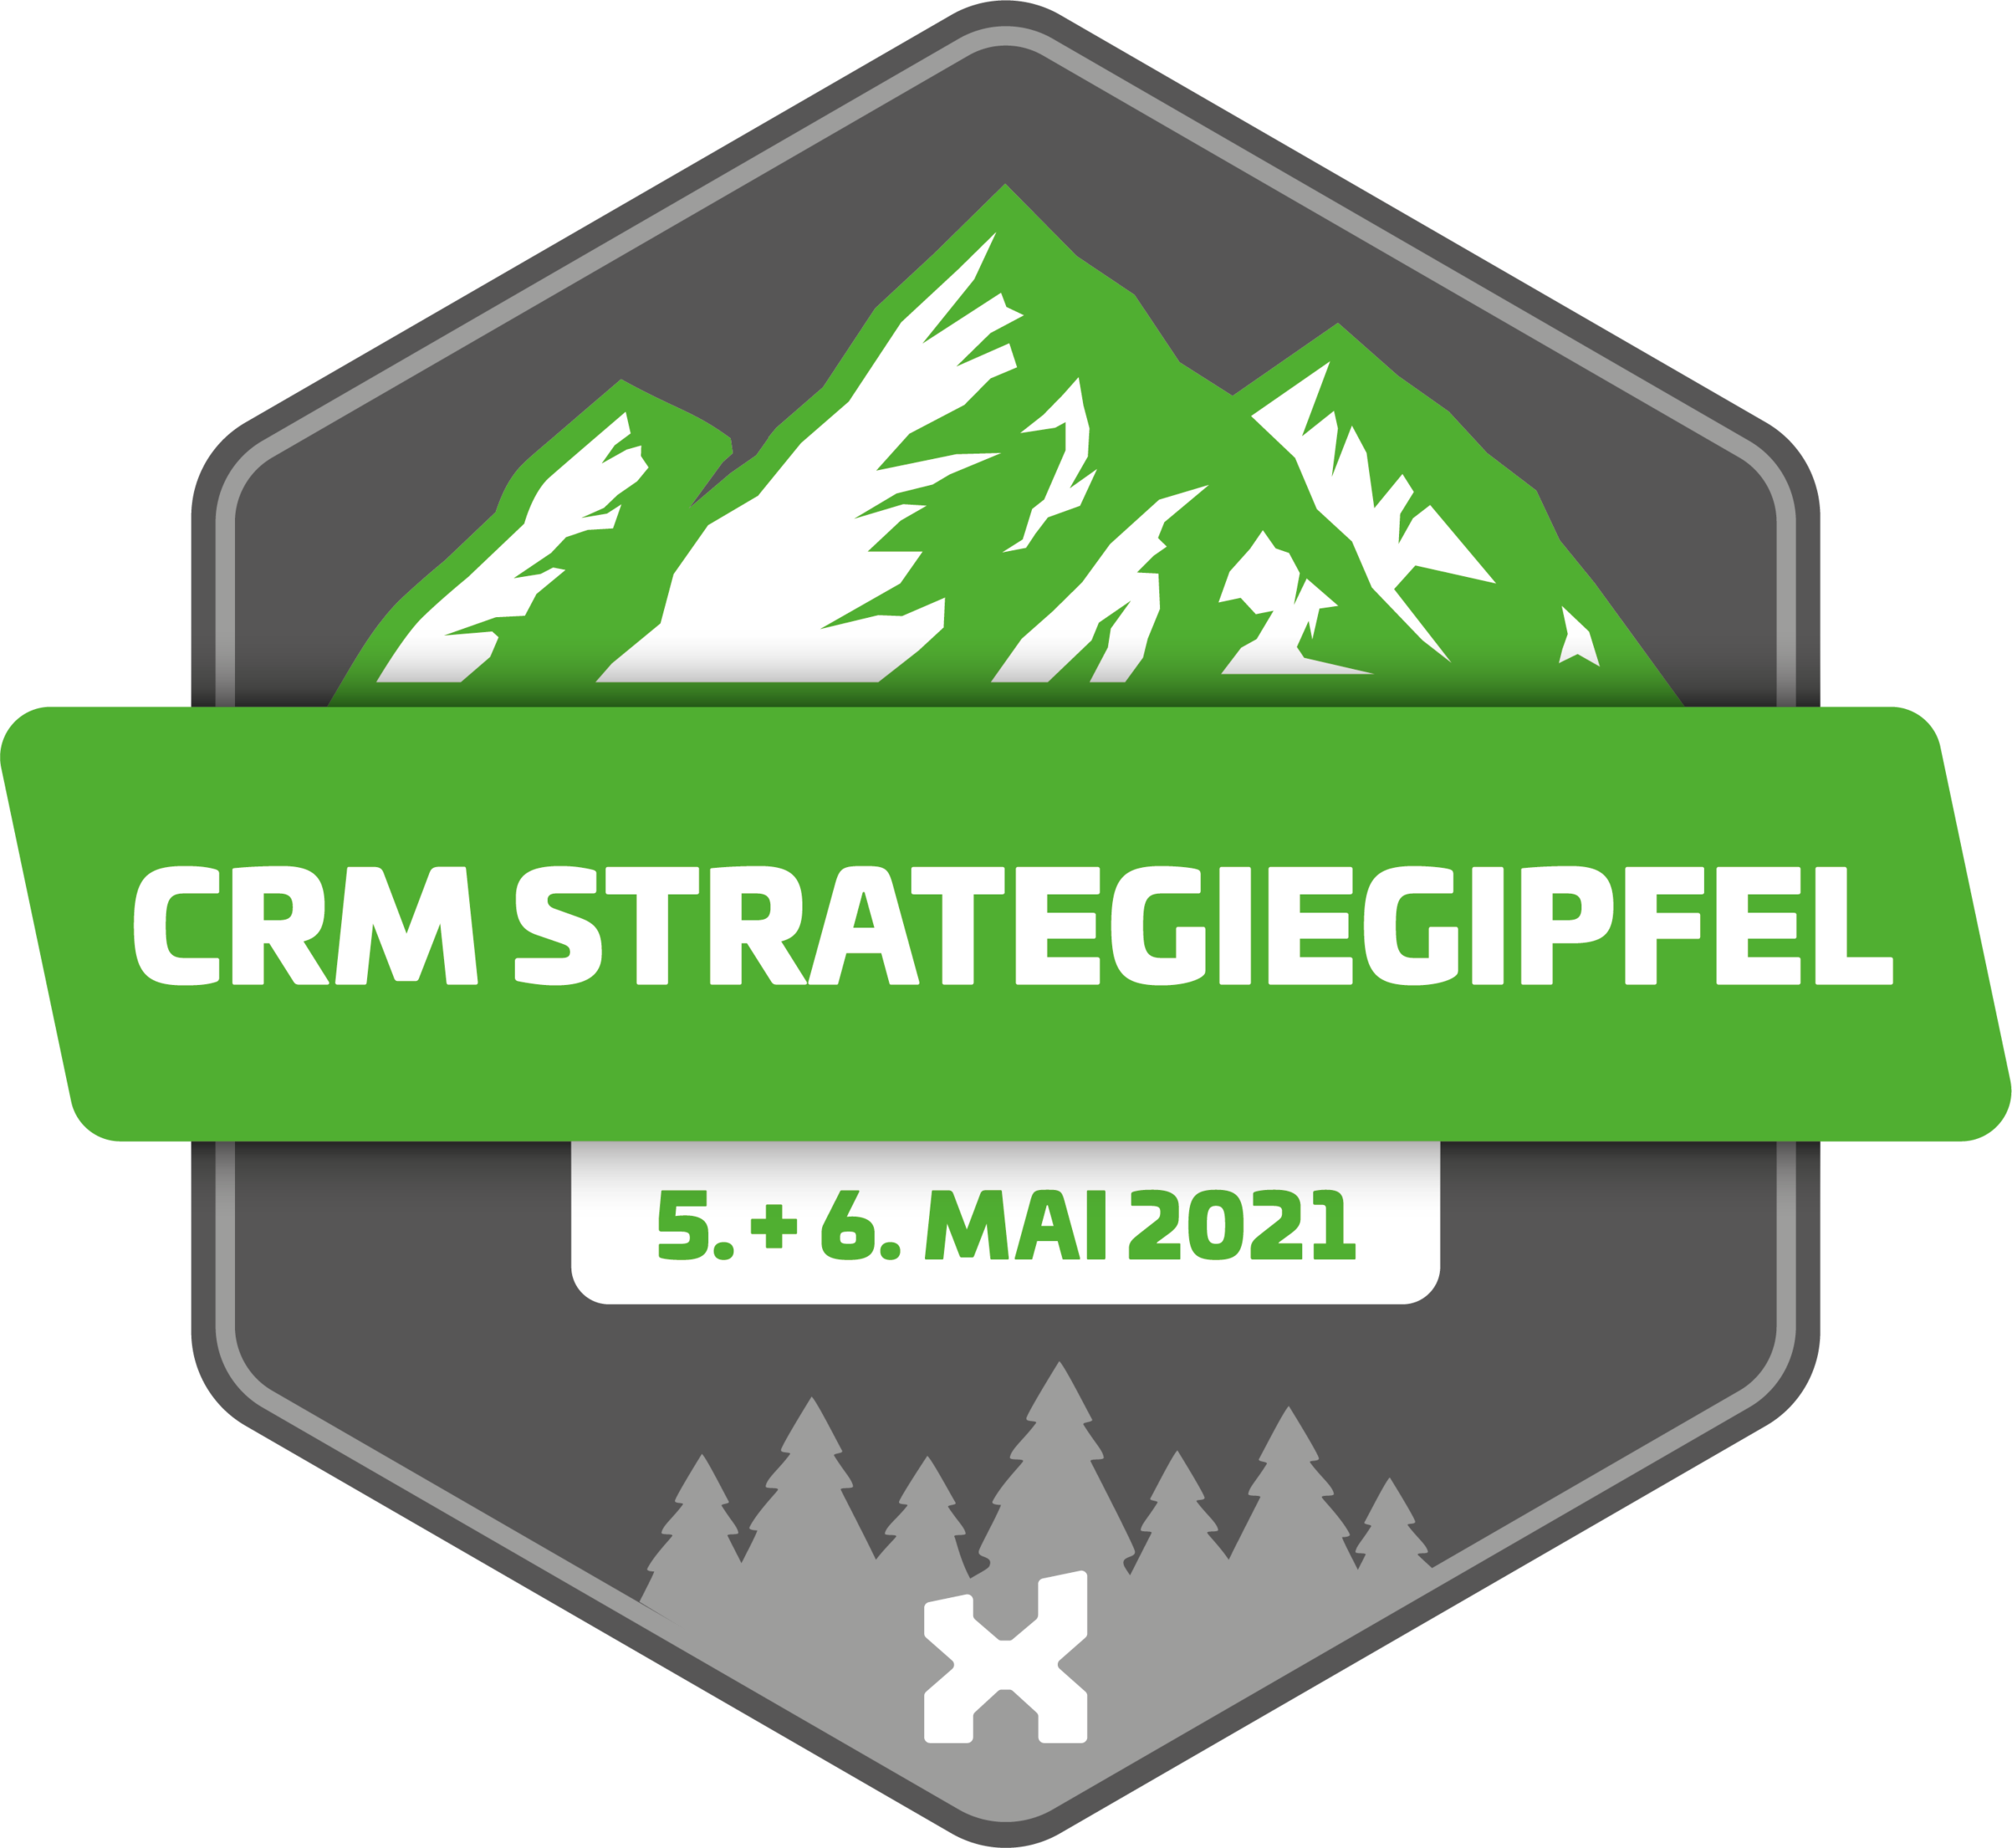 itmX - crm Strategiegipfel Badge